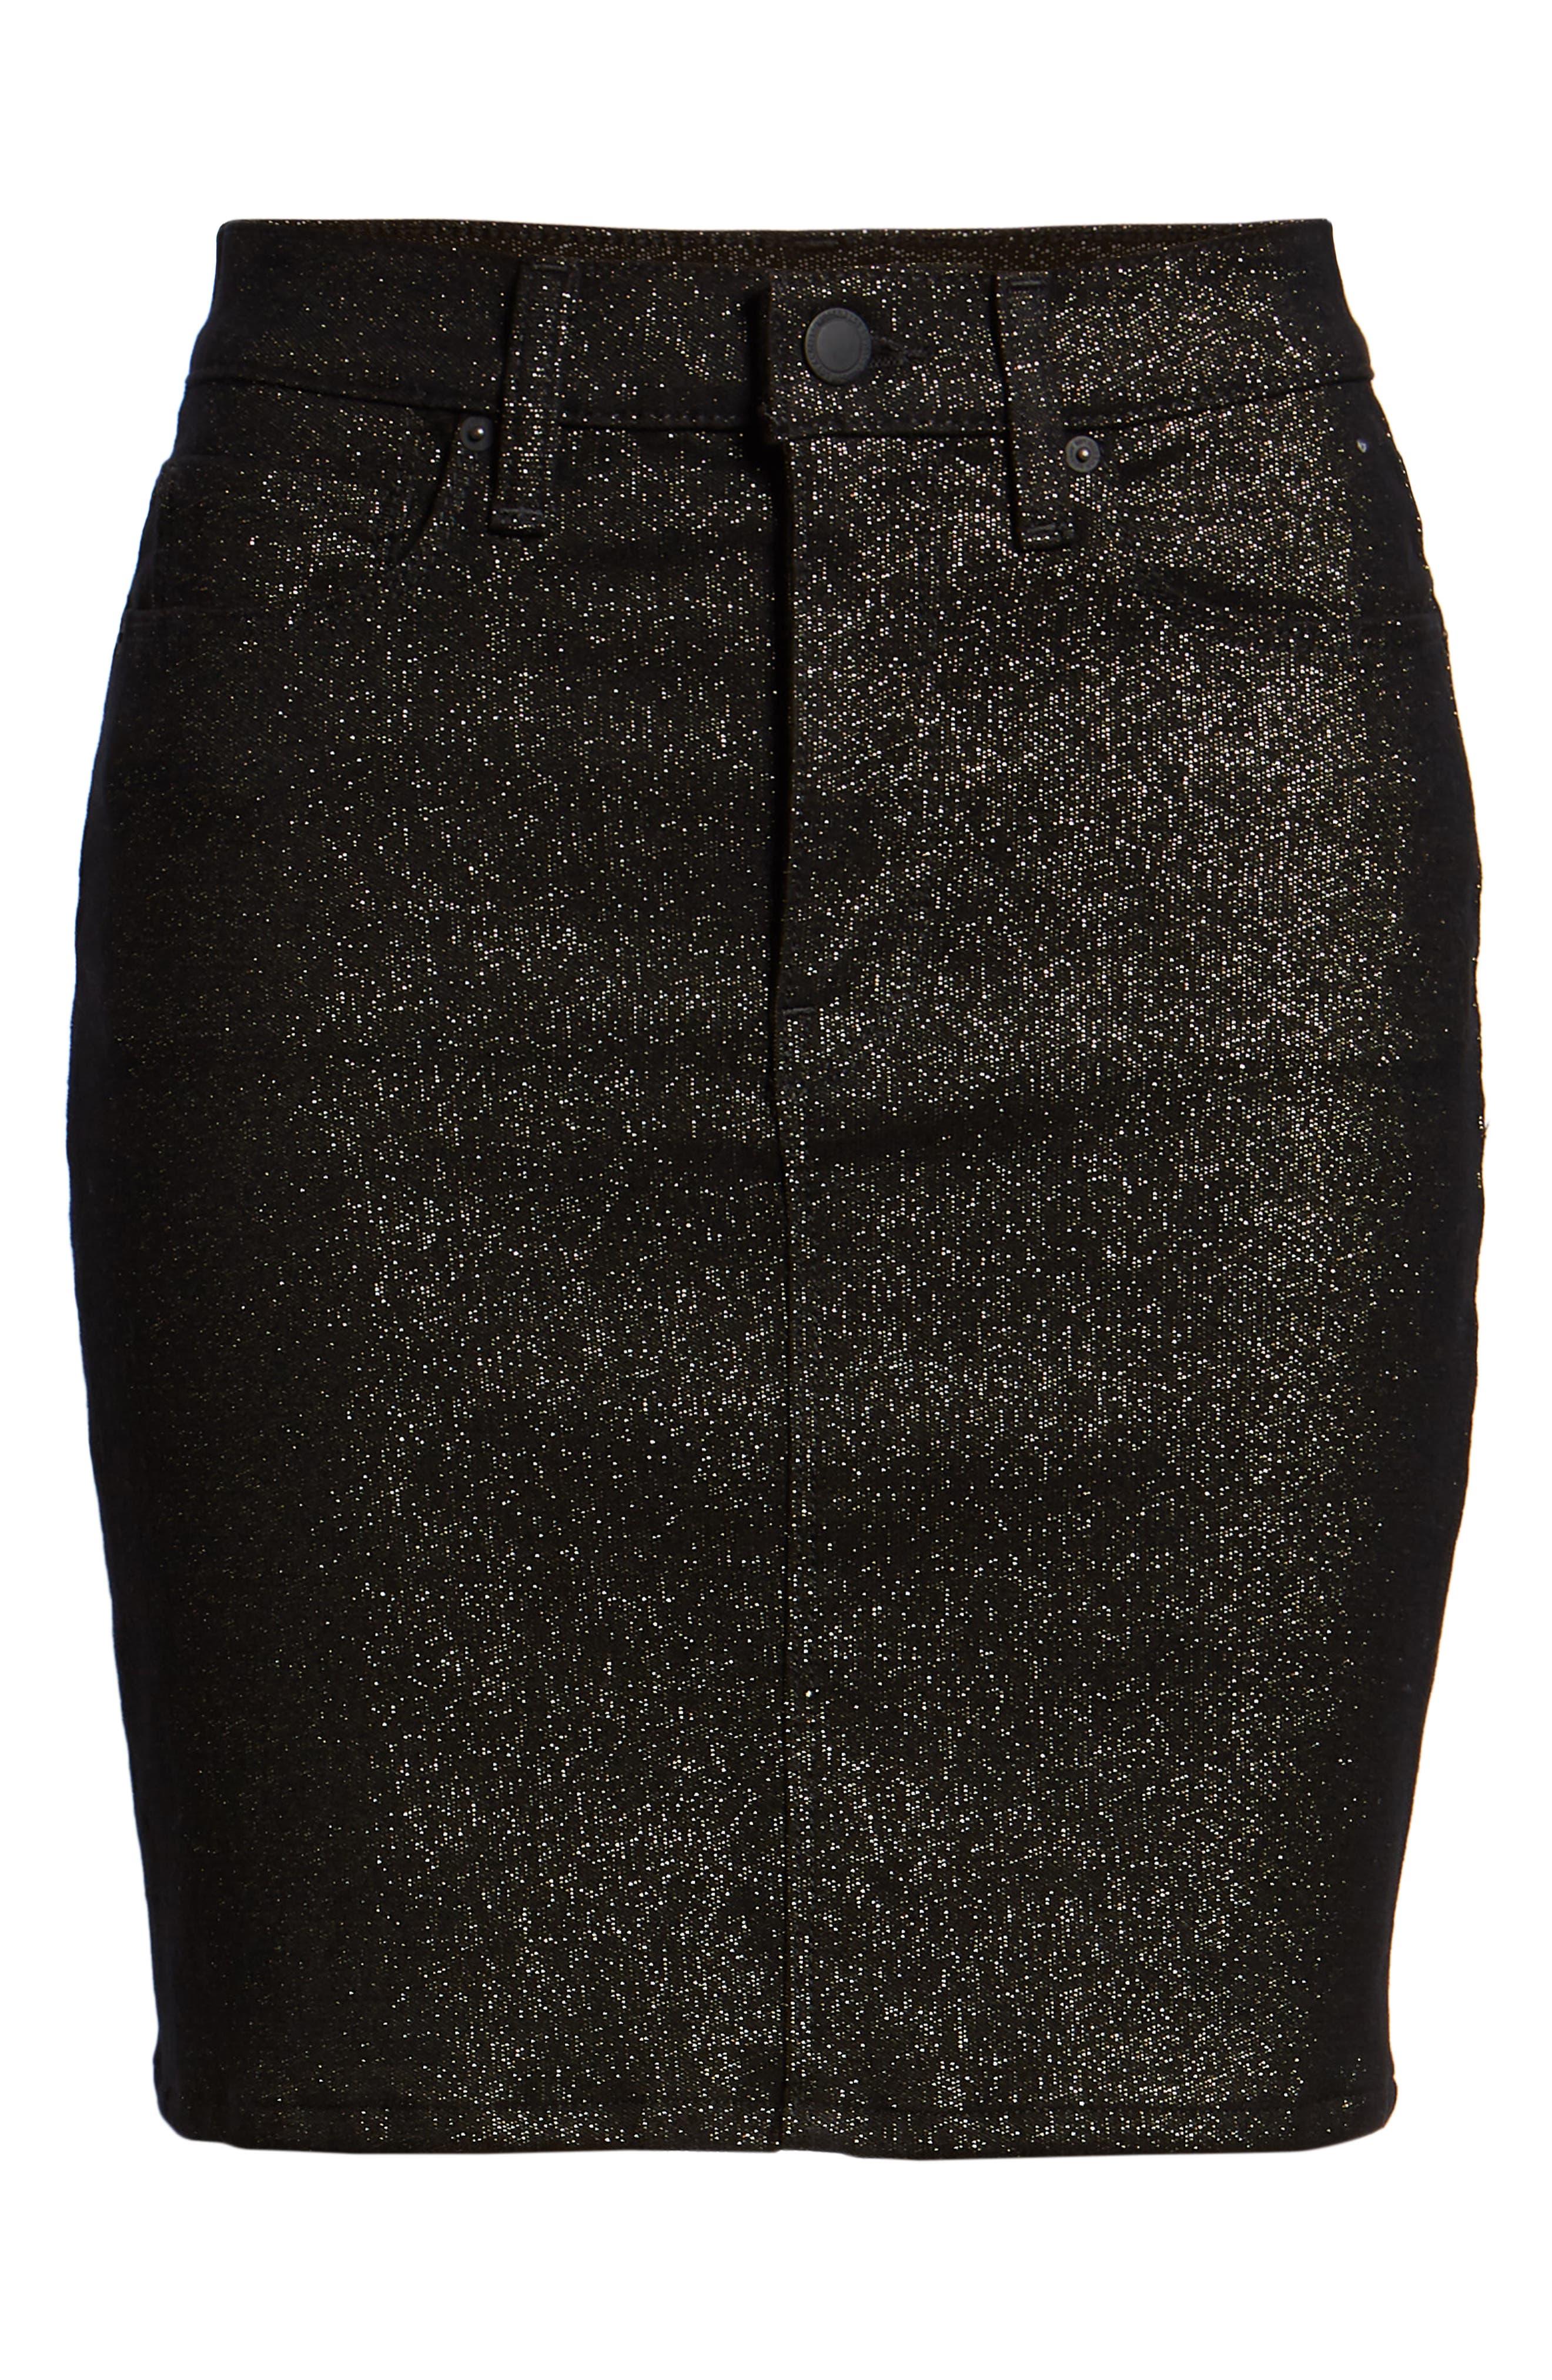 Lulu Sparkle Miniskirt,                             Alternate thumbnail 7, color,                             GOLD STELLAR